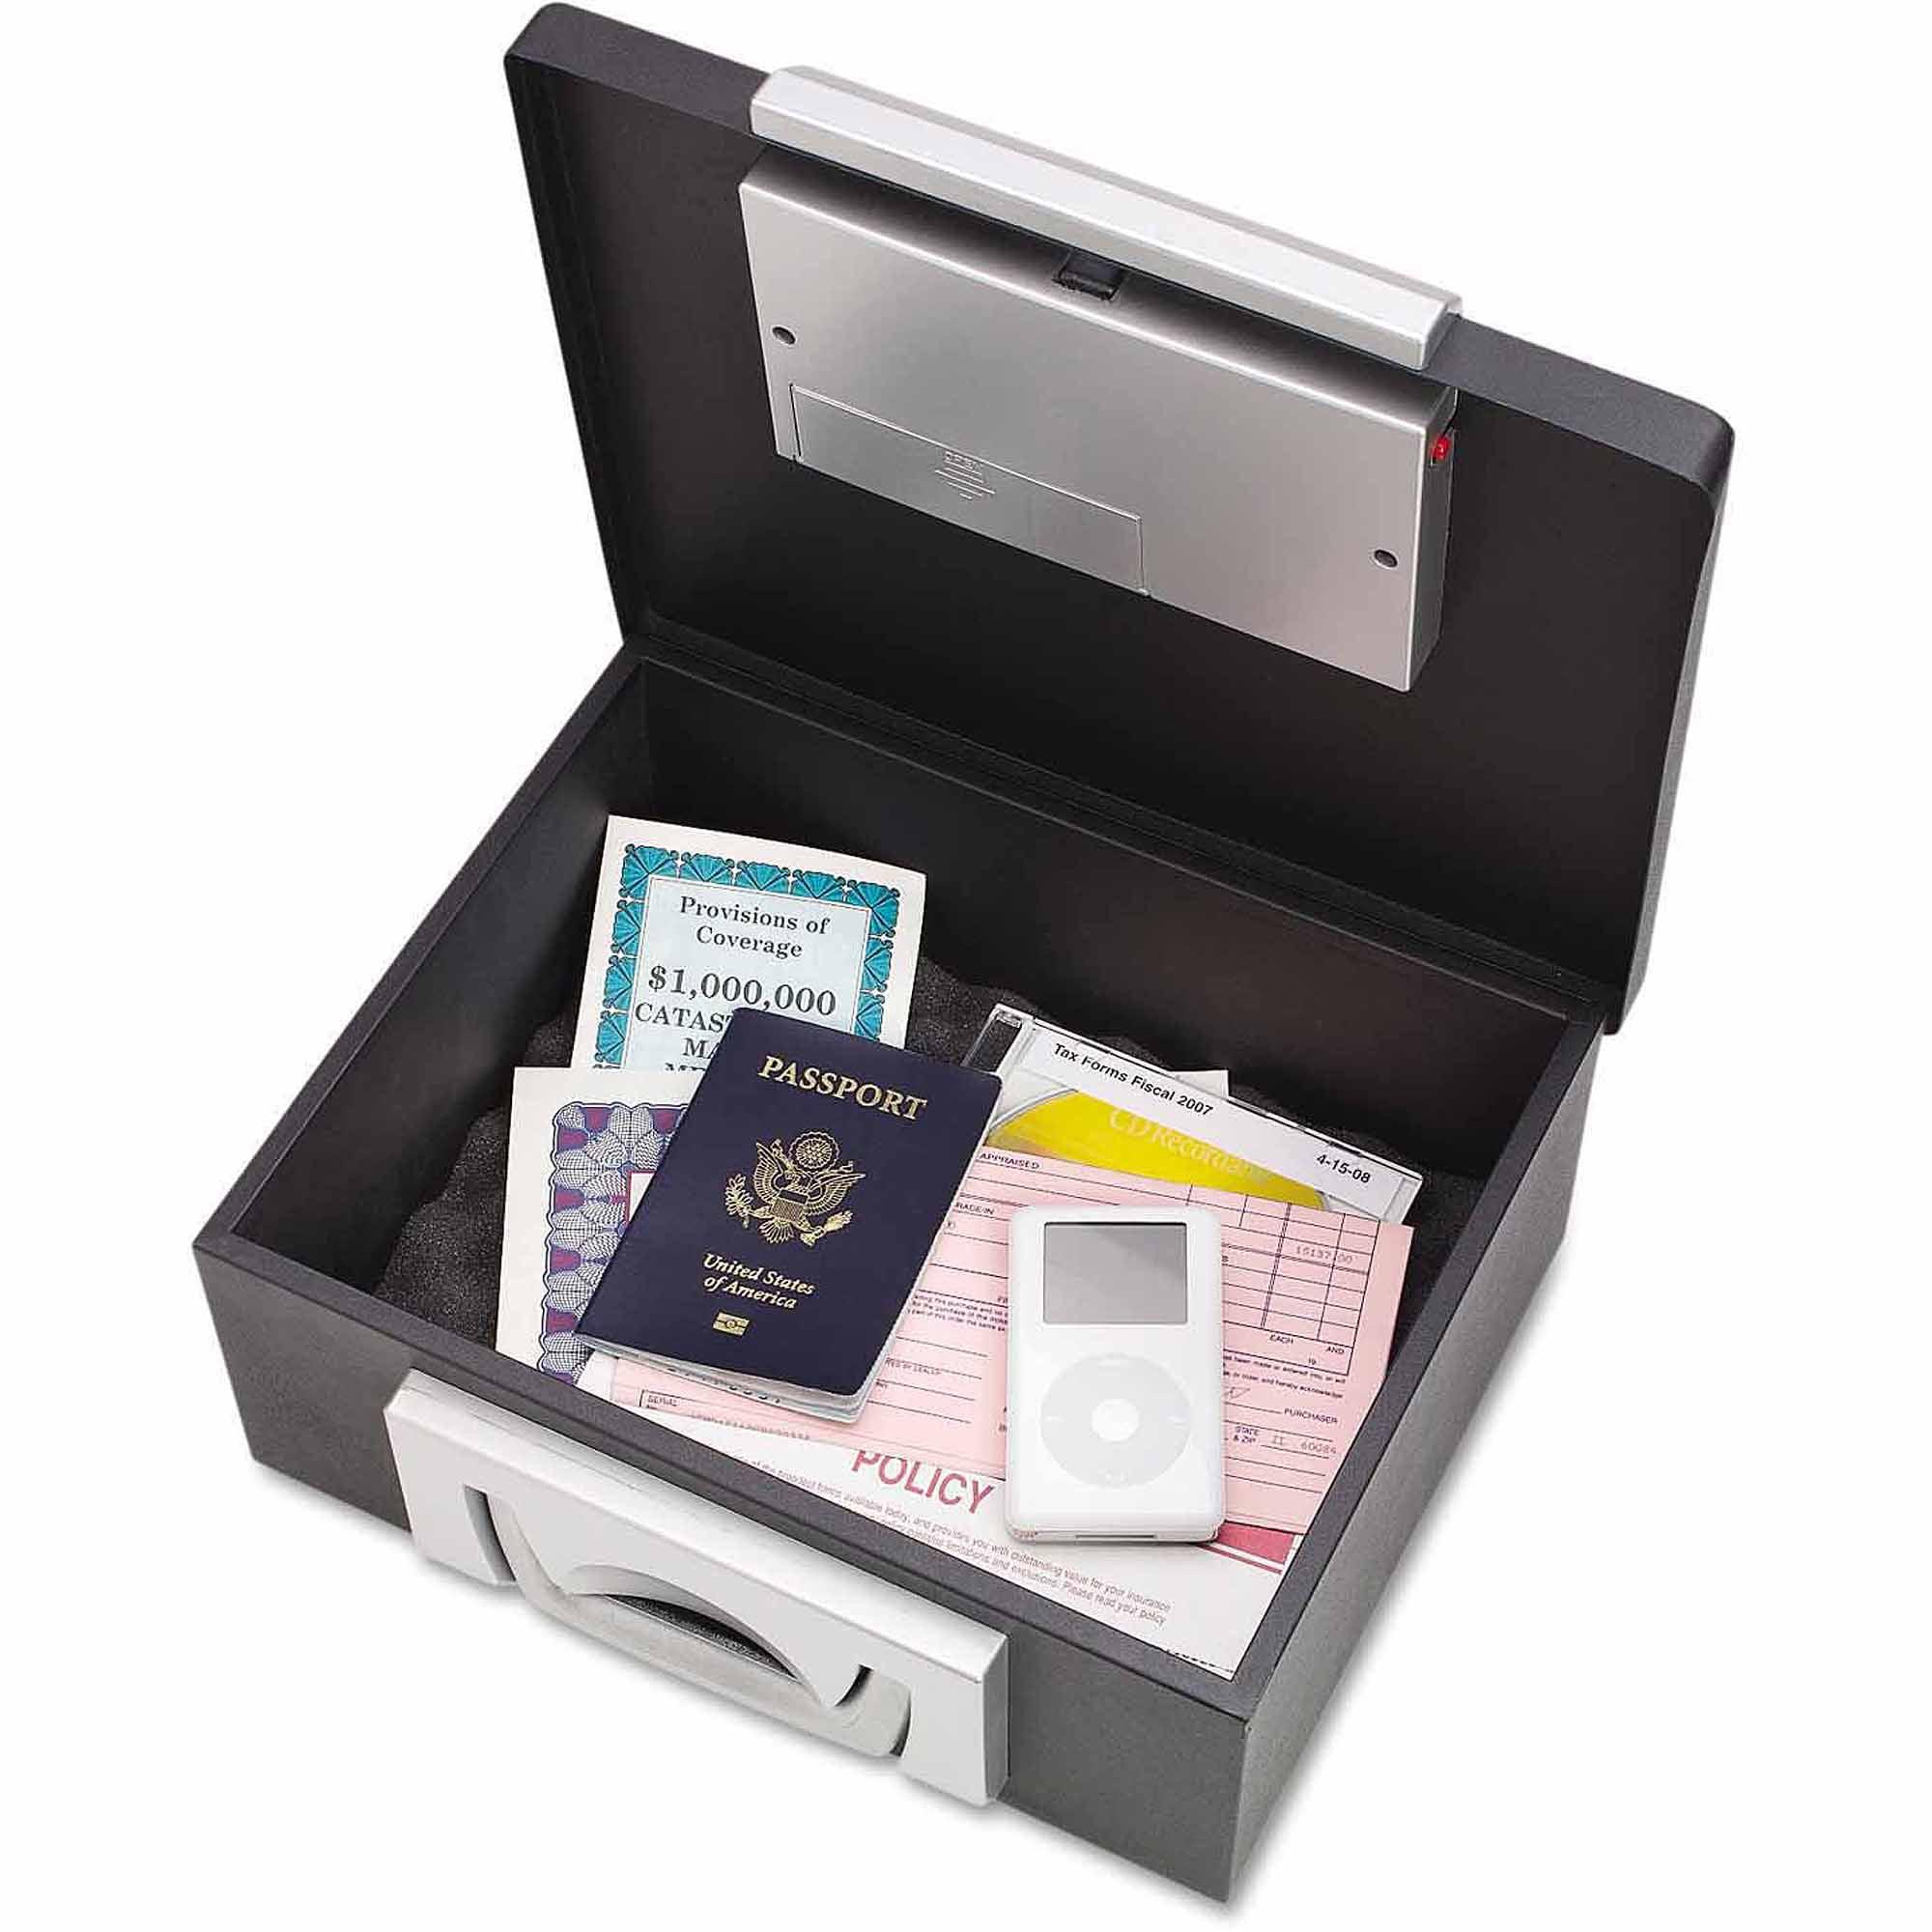 "SteelMaster Electronic Cash Box, 12-7/8"" x 11-1/8"" x 6.25"", Combination Lock, Black"